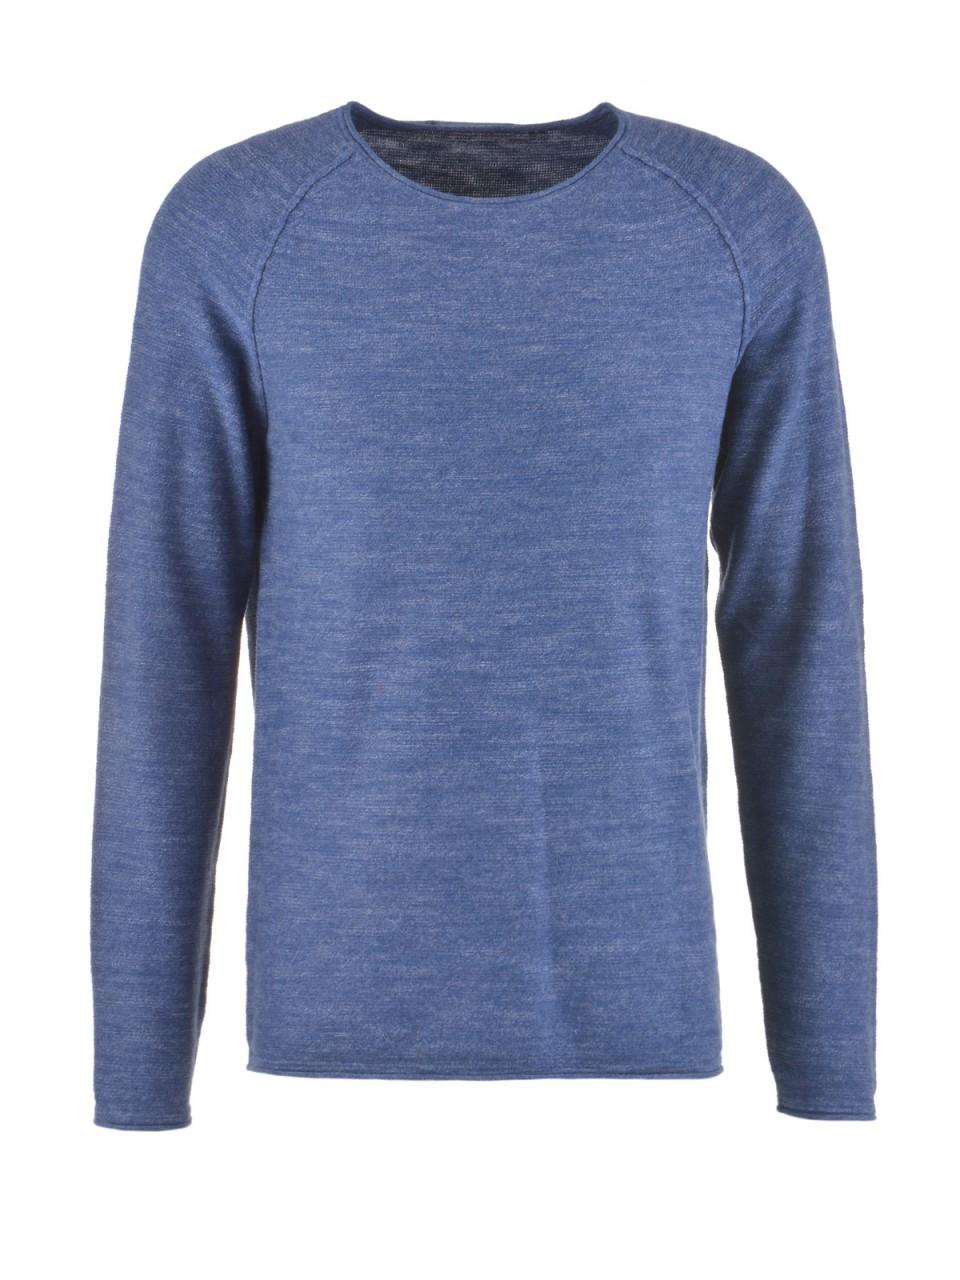 milano-italy-herren-pullover-blau